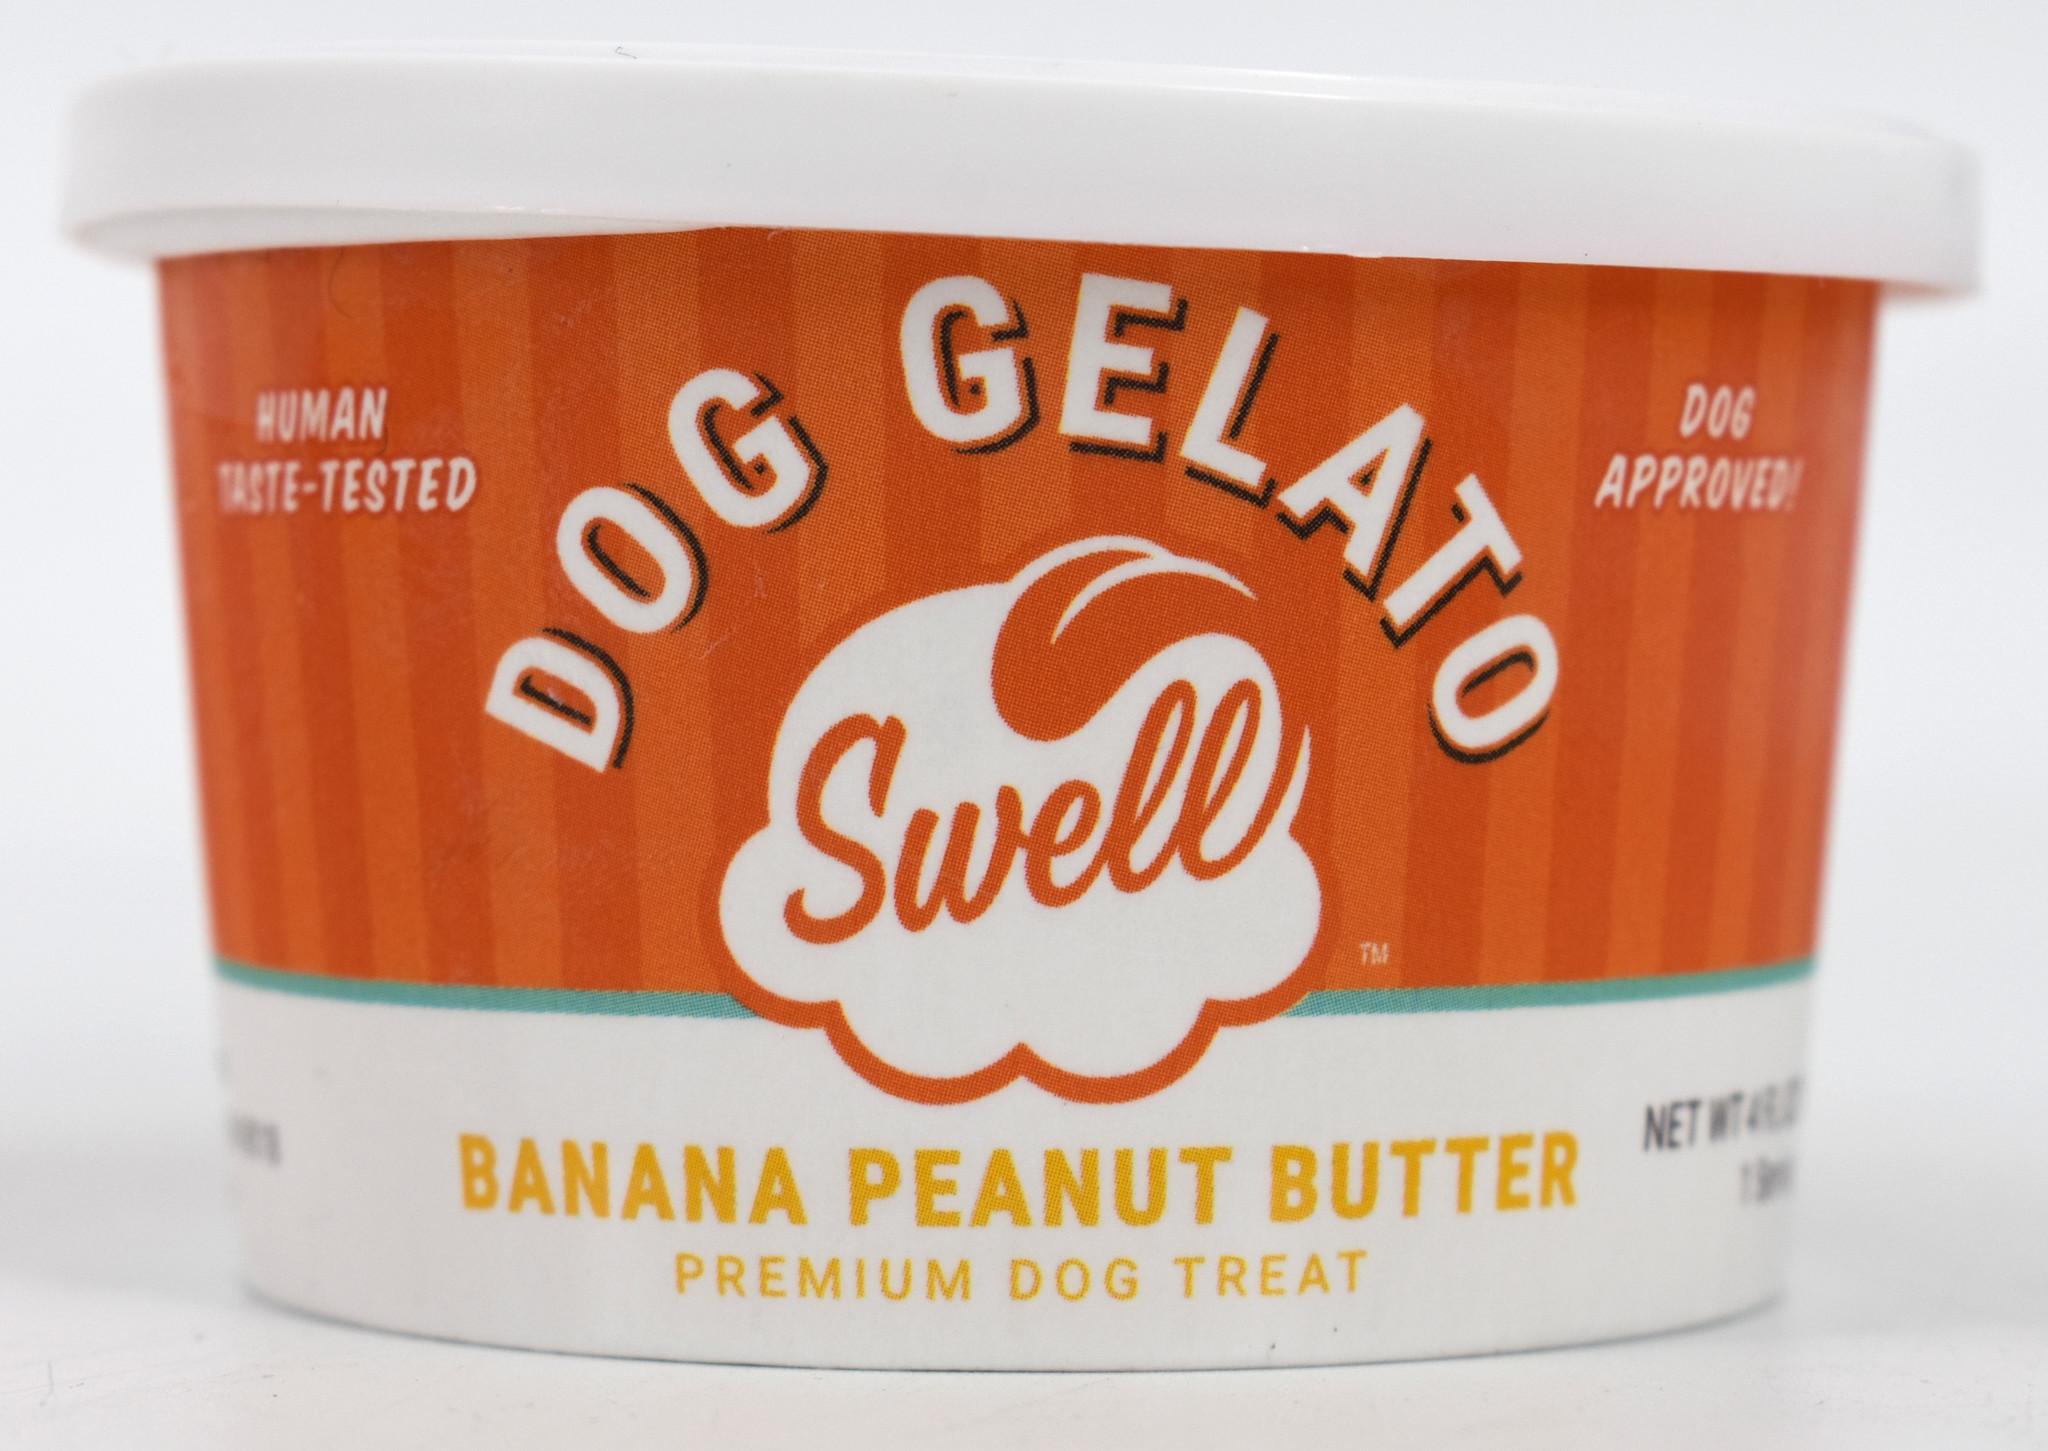 Swell Gelato Banana Peanut Butter Frozen Dog Treat